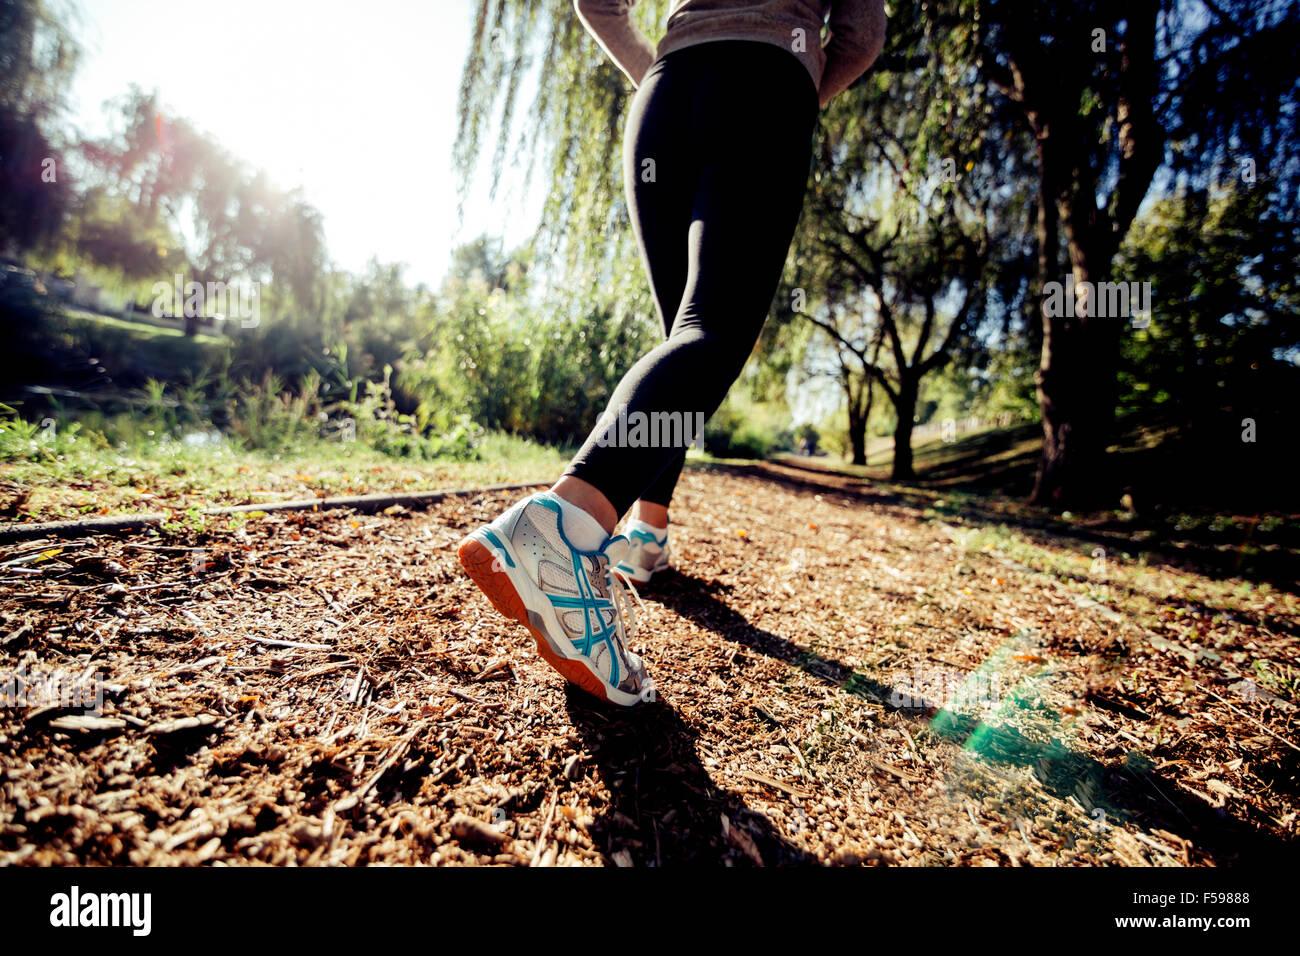 Closeup of runner feet jogging in nature - Stock Image